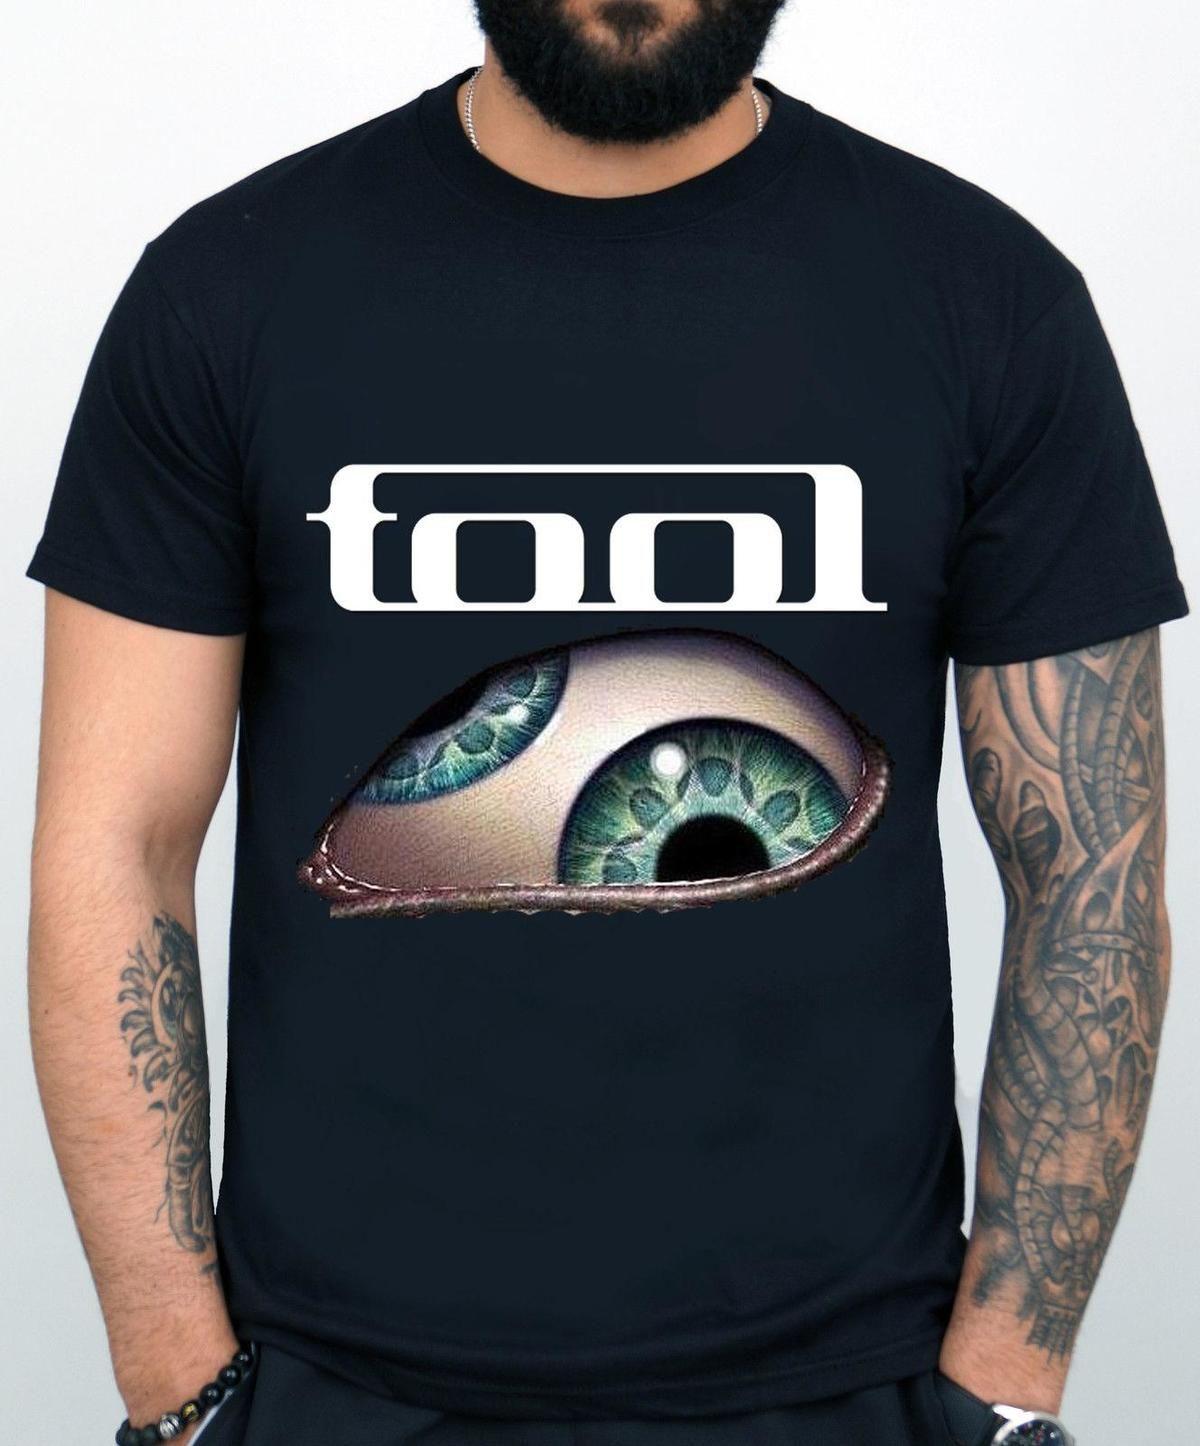 37b0e8fc4 T Shirt Rock Band For Sale - Cotswold Hire